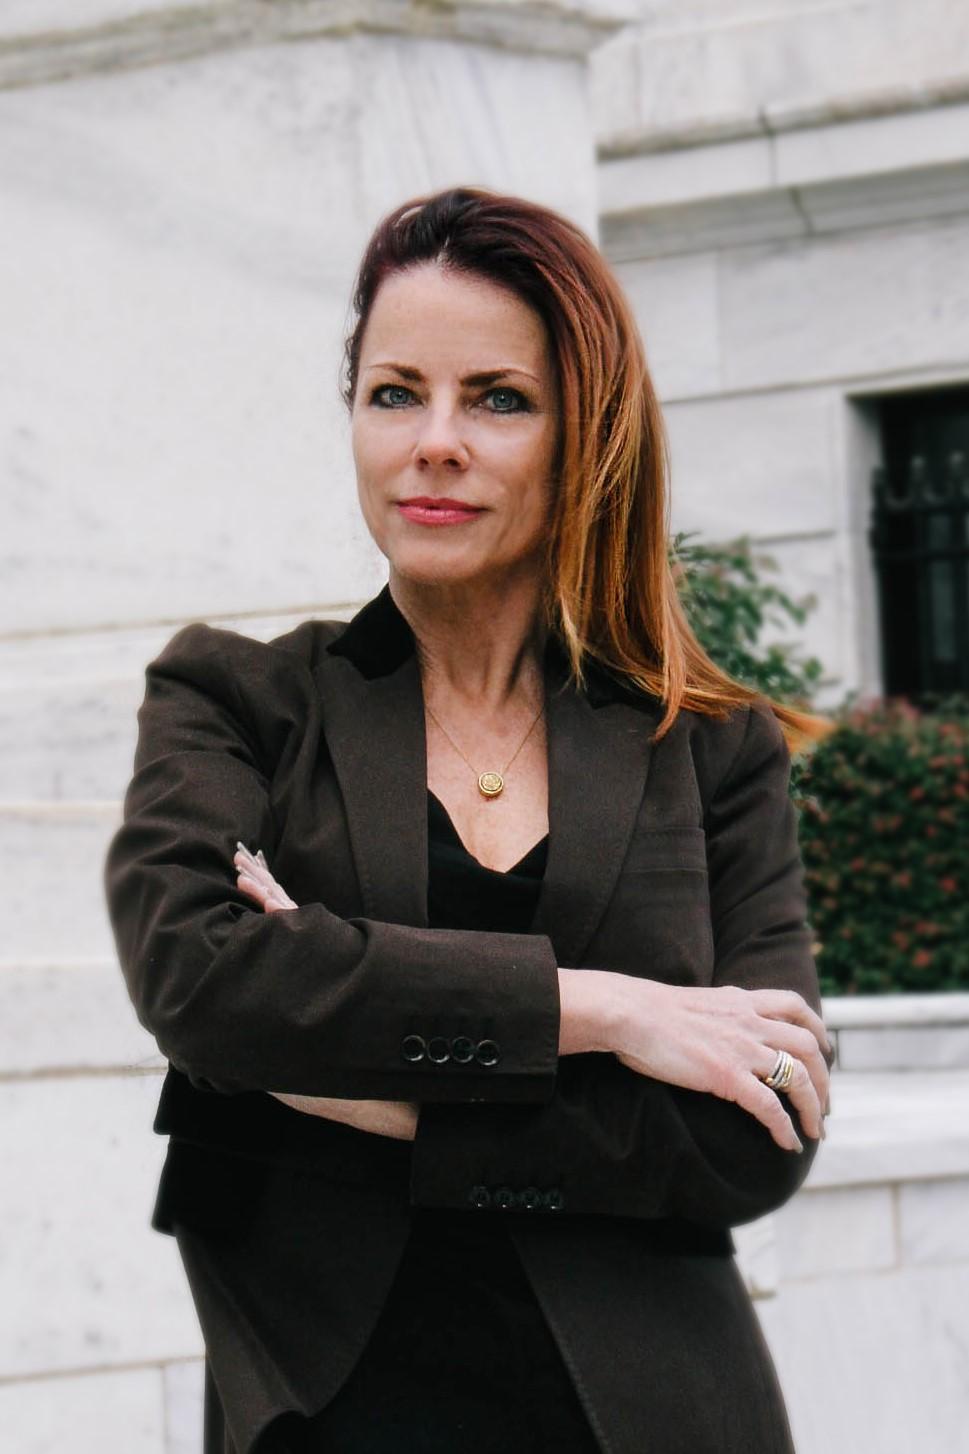 Kimberly Diemert - Executive DirectorKRDiemert@huejackson.org